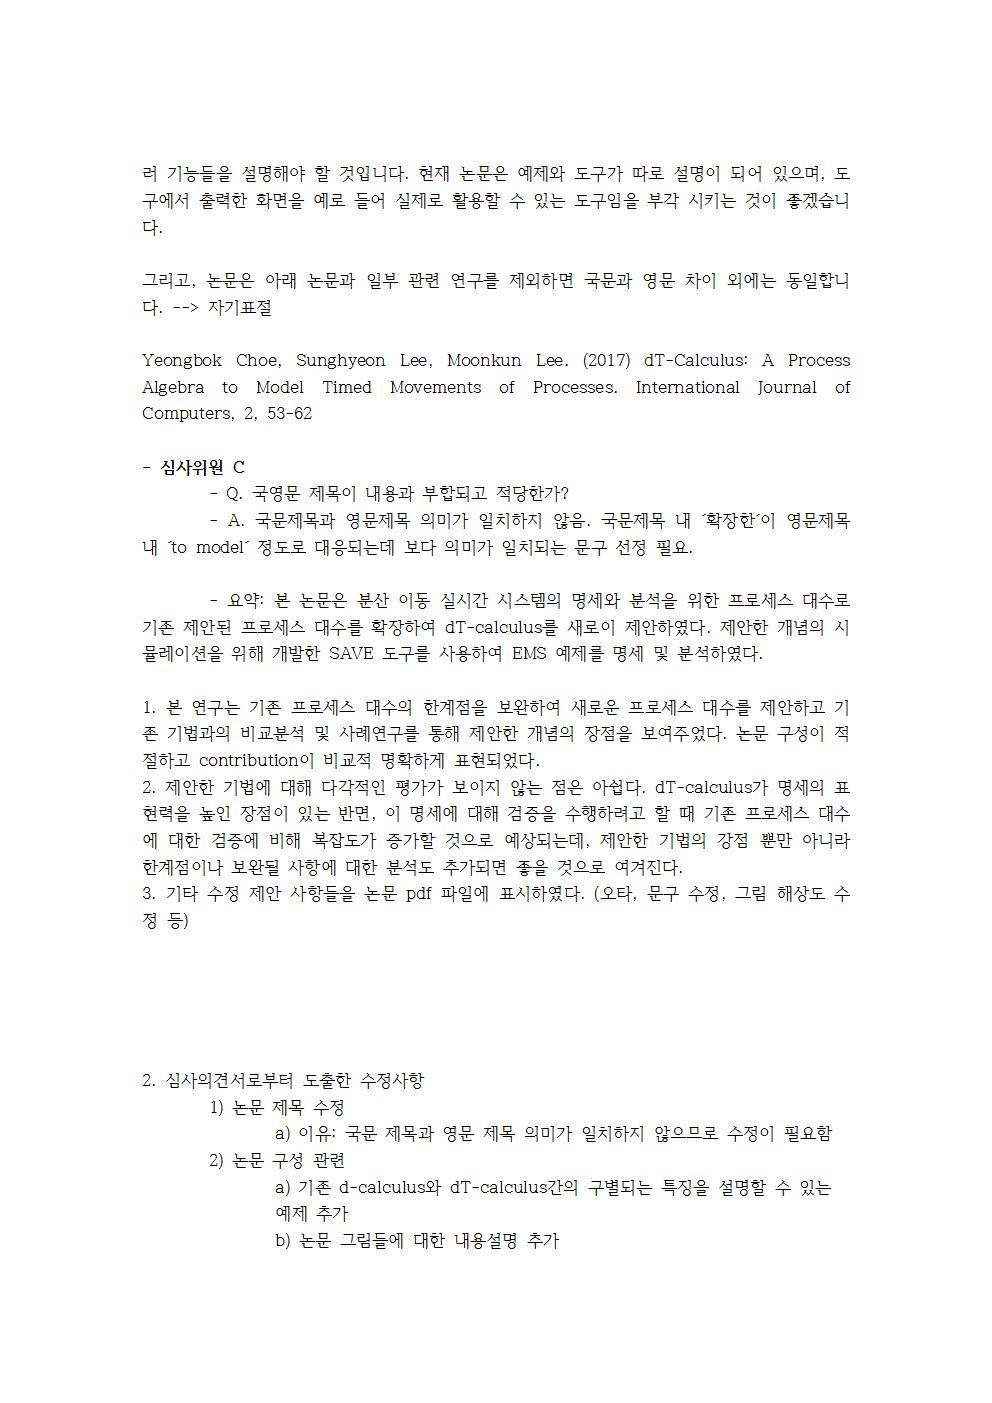 D-[17-084-PP-13]-[KIISE2017-dT-calculus 논문 수정]-[SH]-[2017-09-14]003.jpg